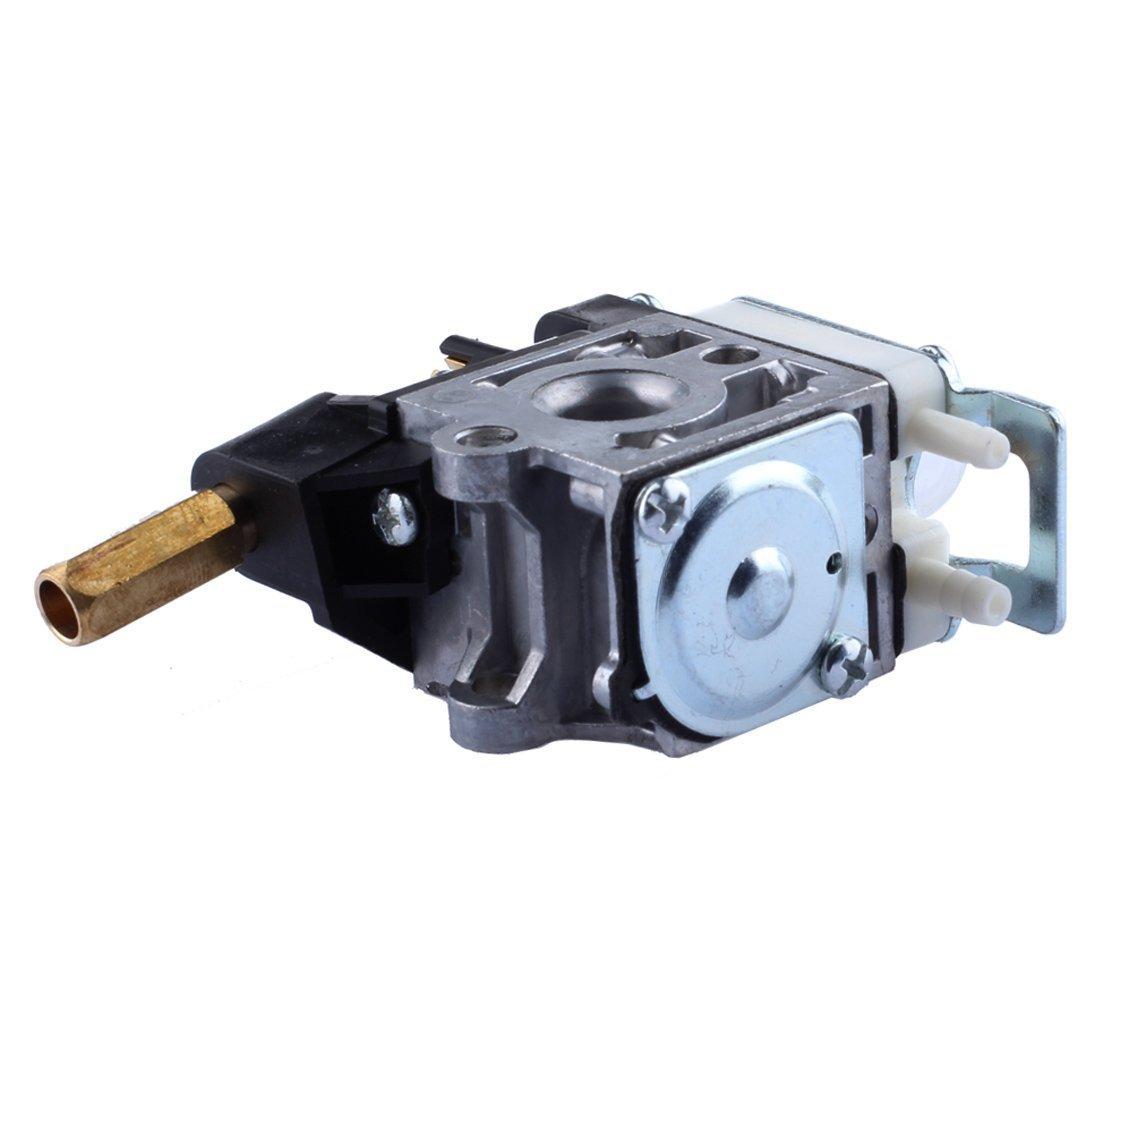 Podoy SRM210 Carburetor for ECHO Trimmer Parts PE200 Carb Fuel Line Kit  Tune Up Primer Bulb ...